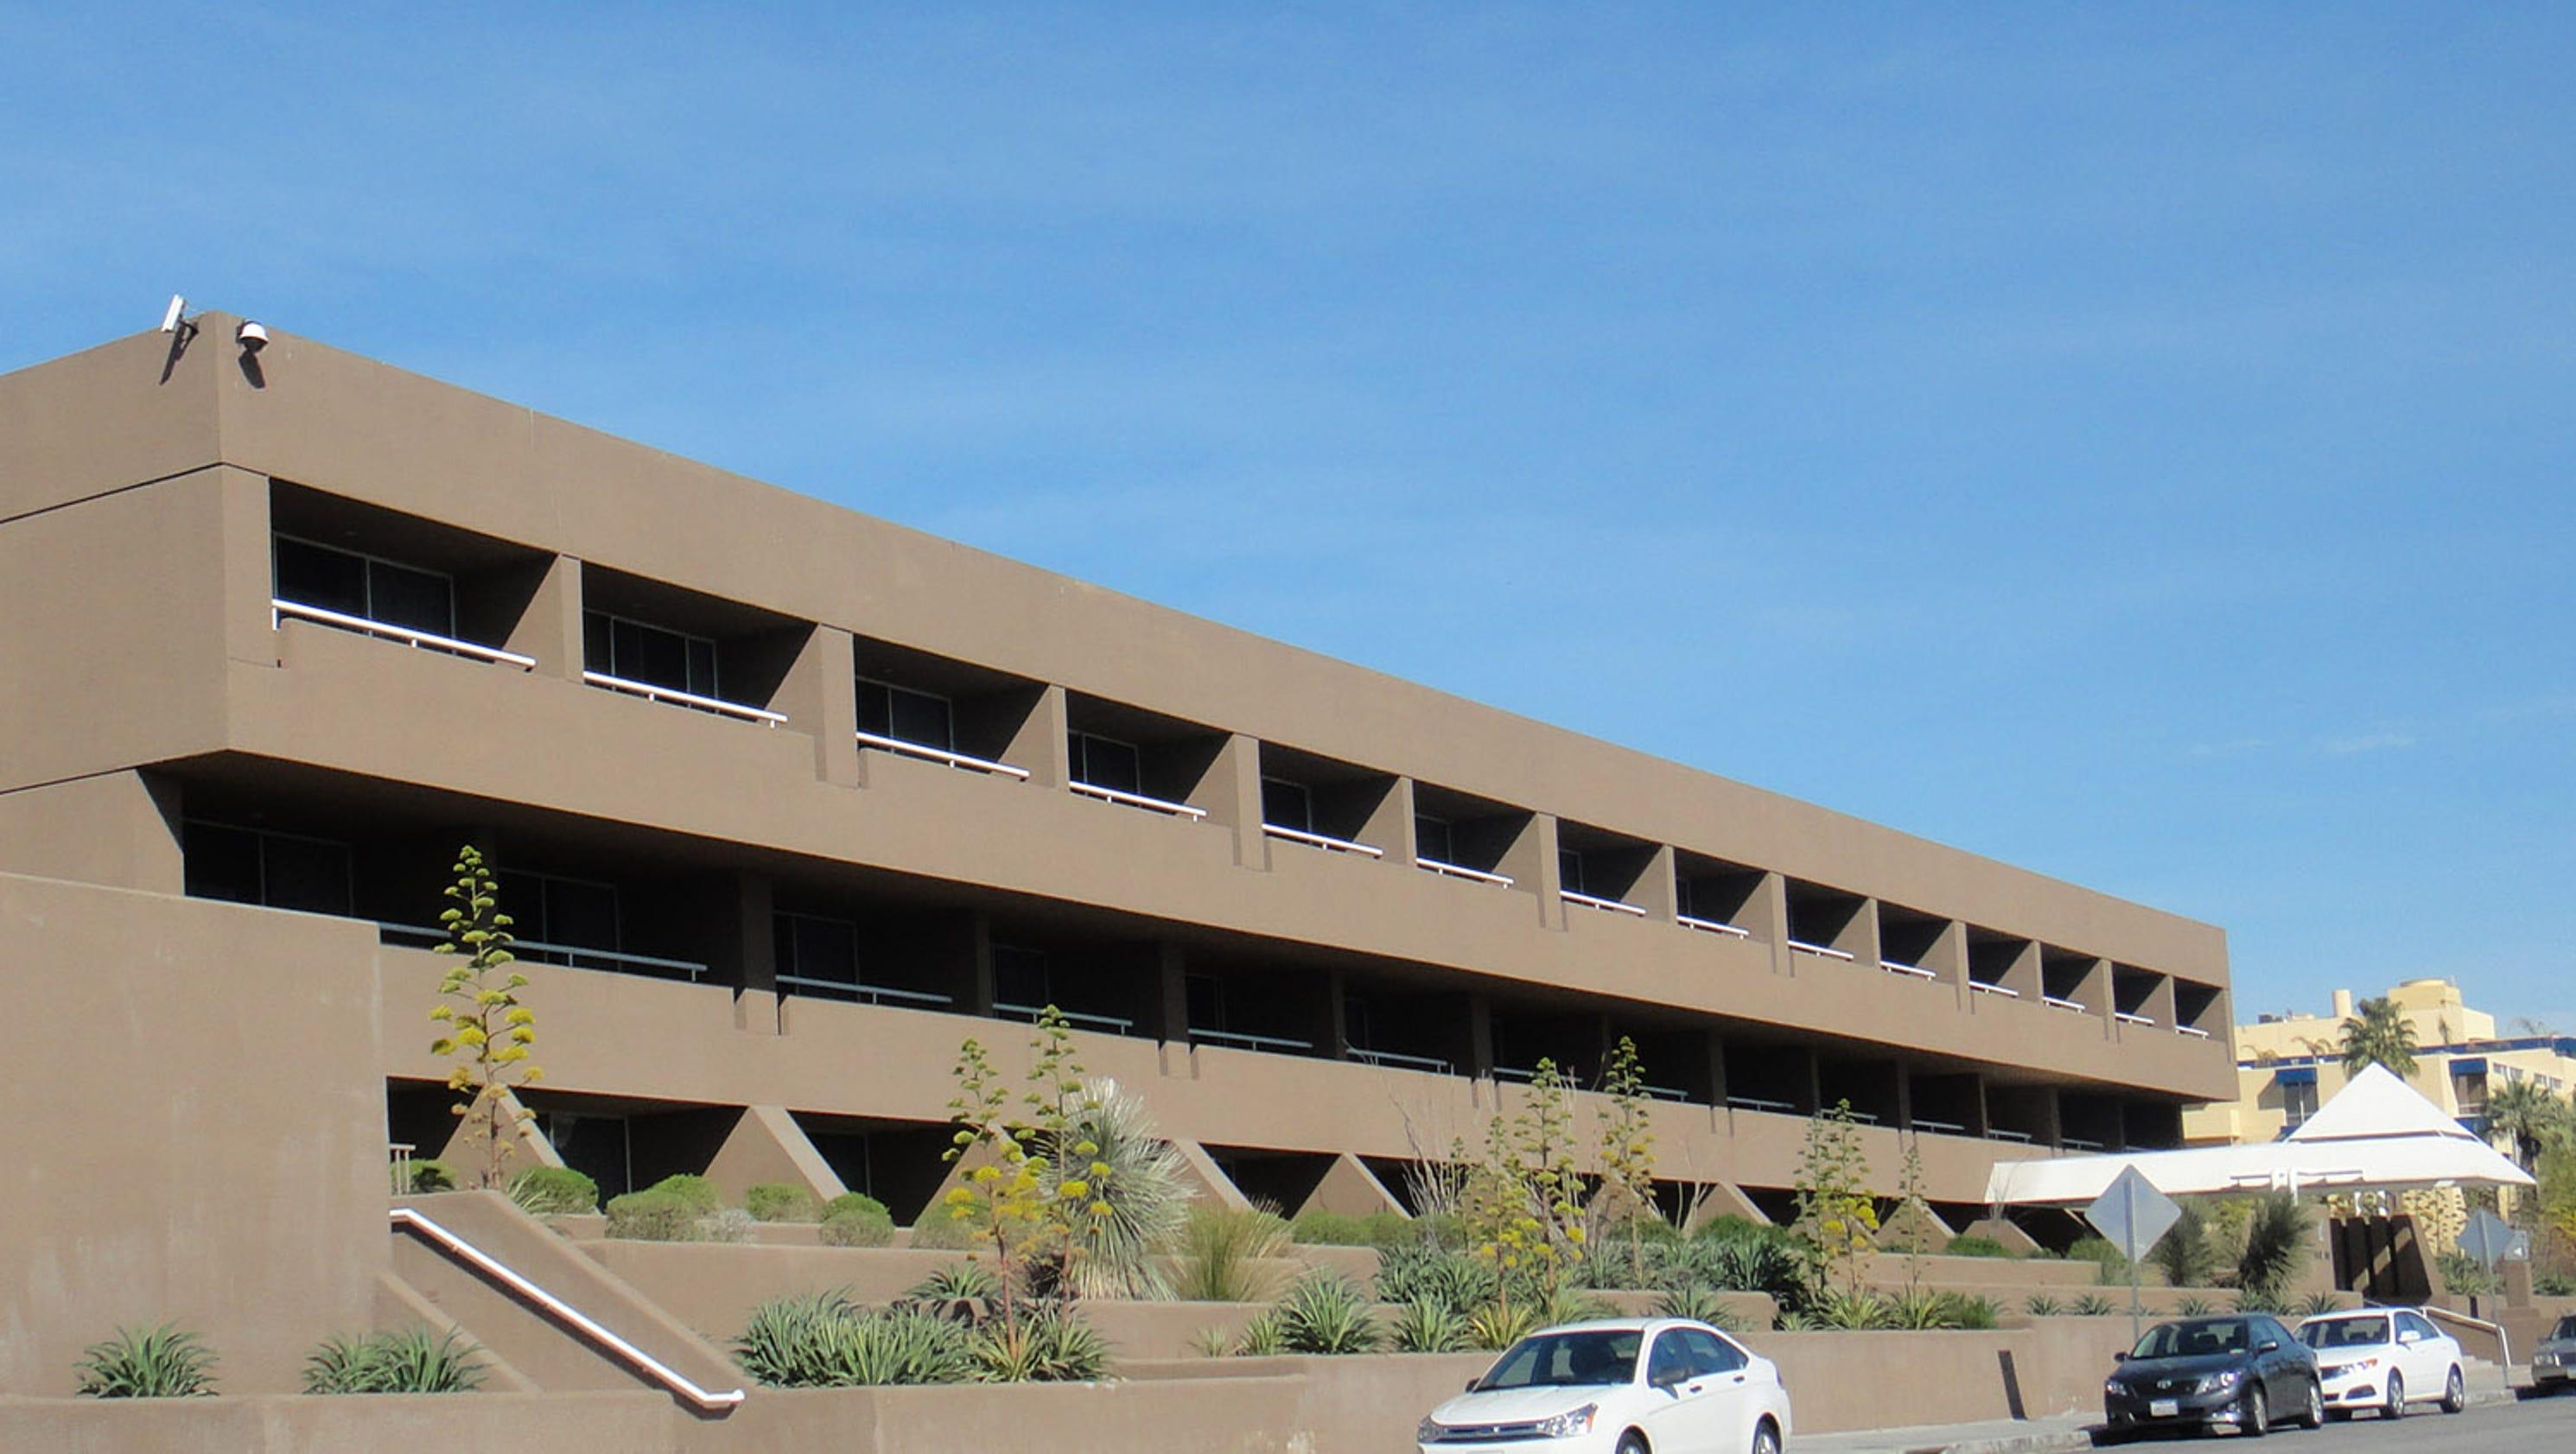 Hard Rock Hotel Jobs Palm Springs